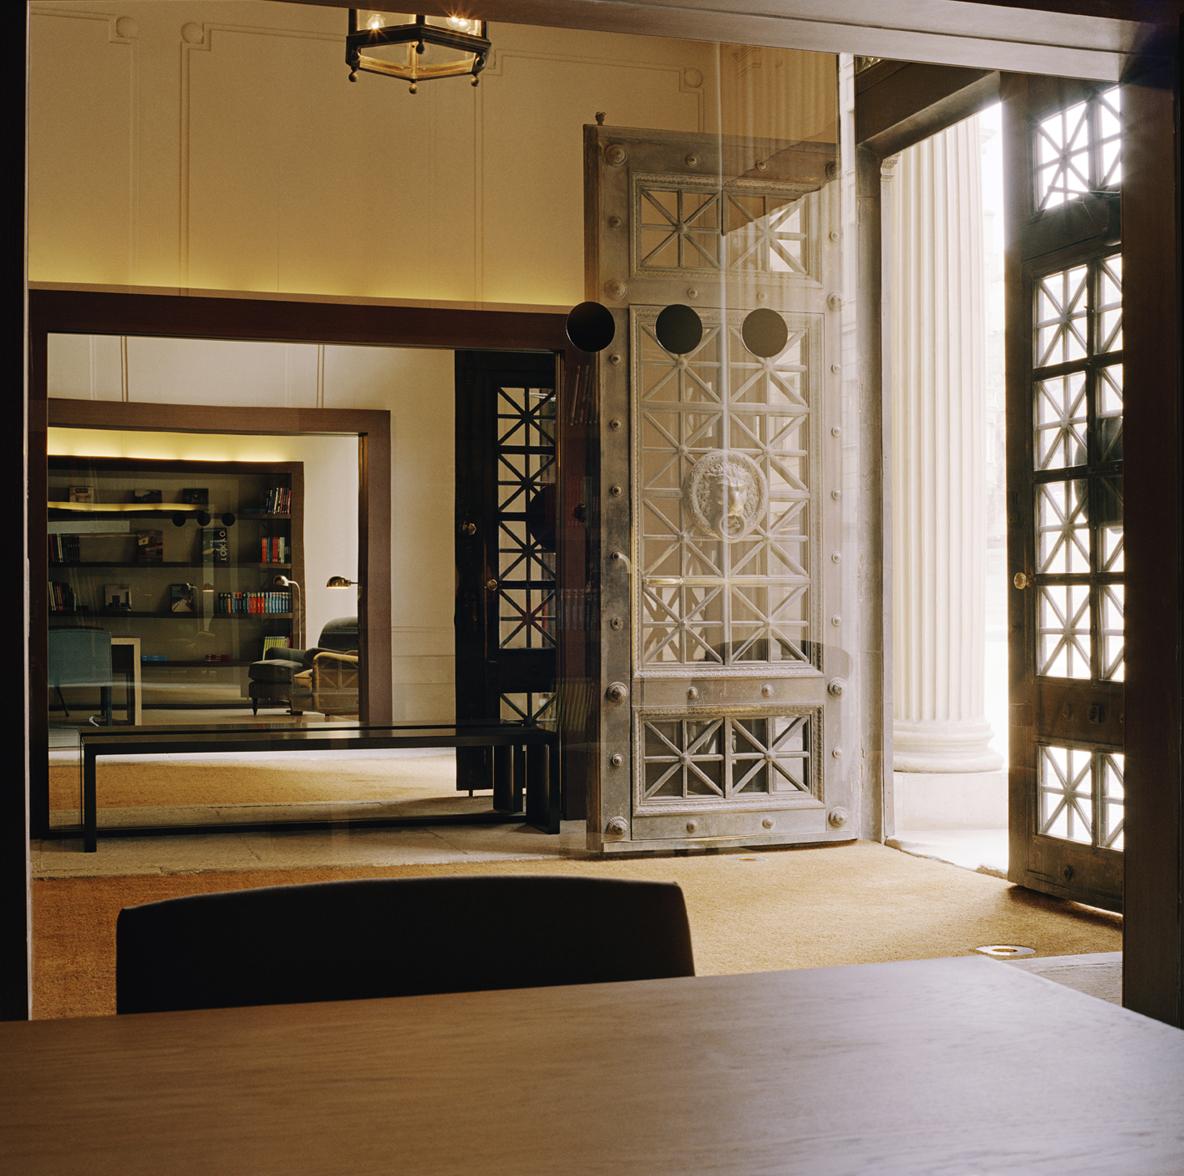 hotels Grand Hotel Central Barcelona